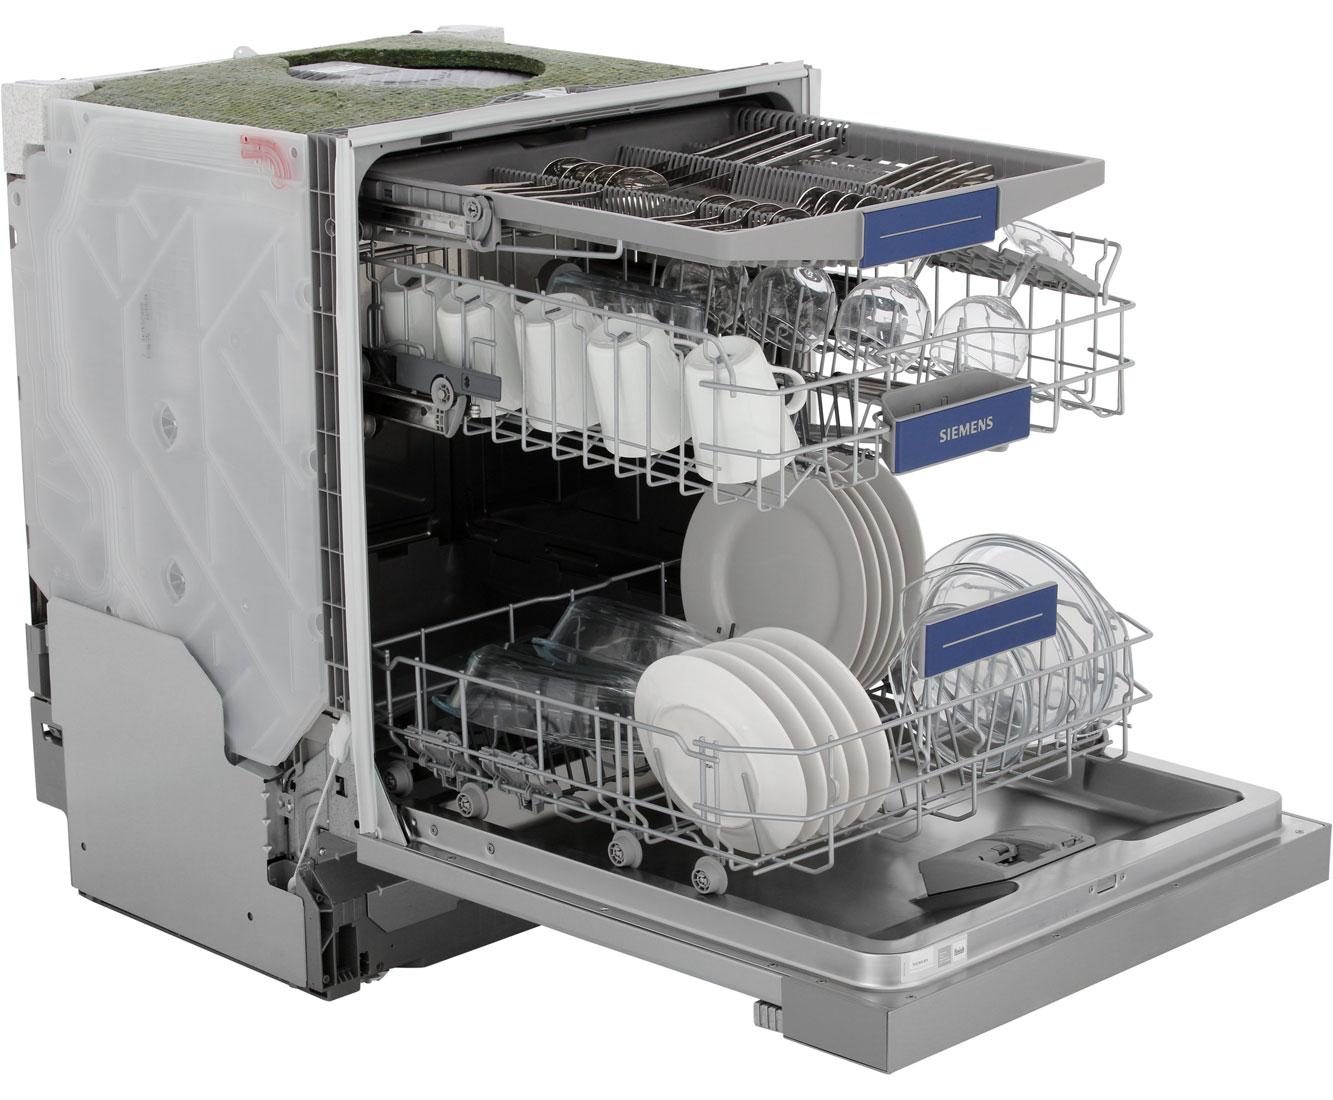 Siemens Sn536s01ke Teilintegrierter Geschirrspüler 60 Cm